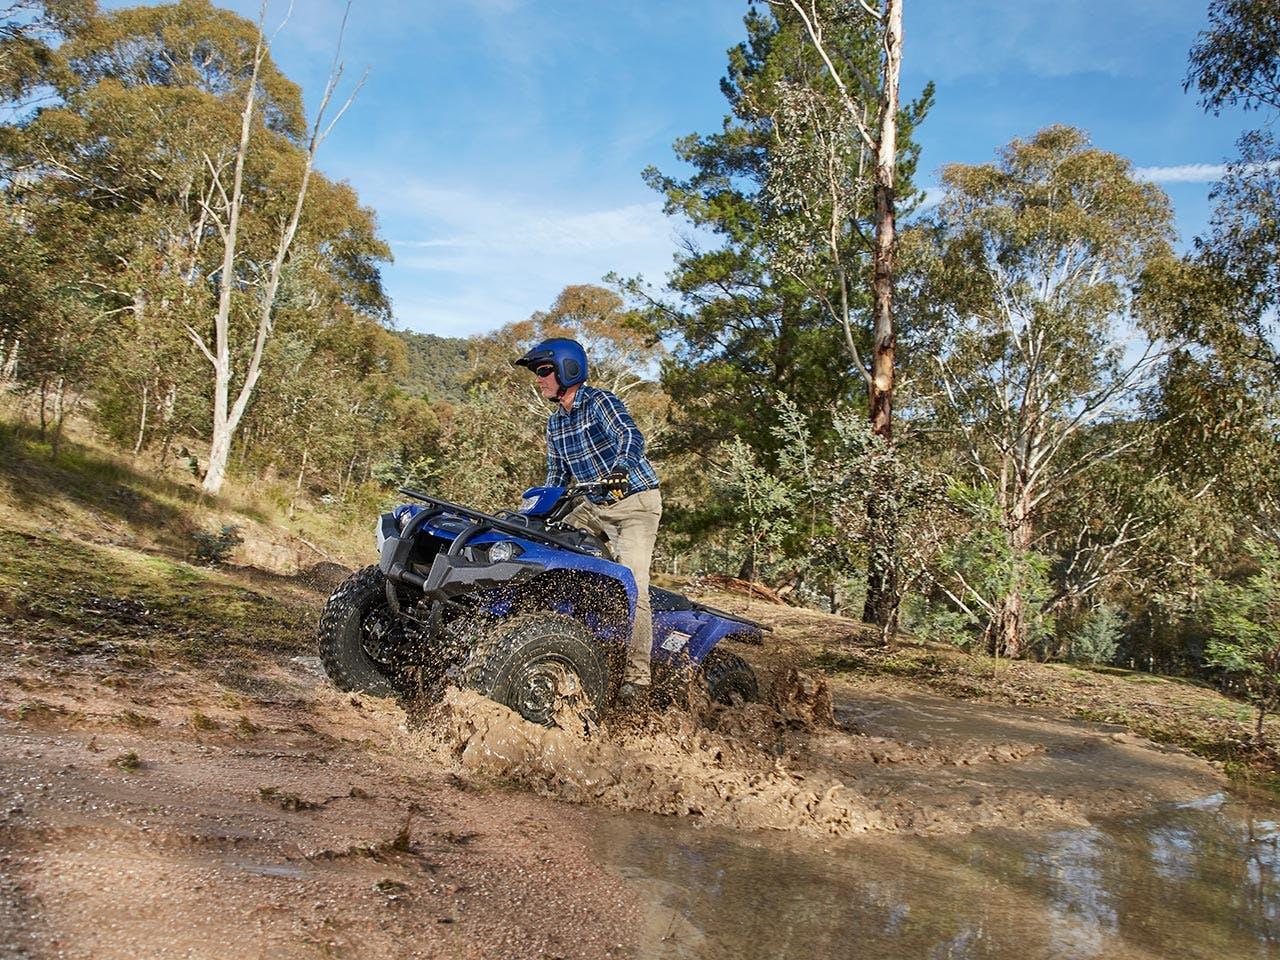 Yamaha Kodiak 450 EPS riding through muddy water